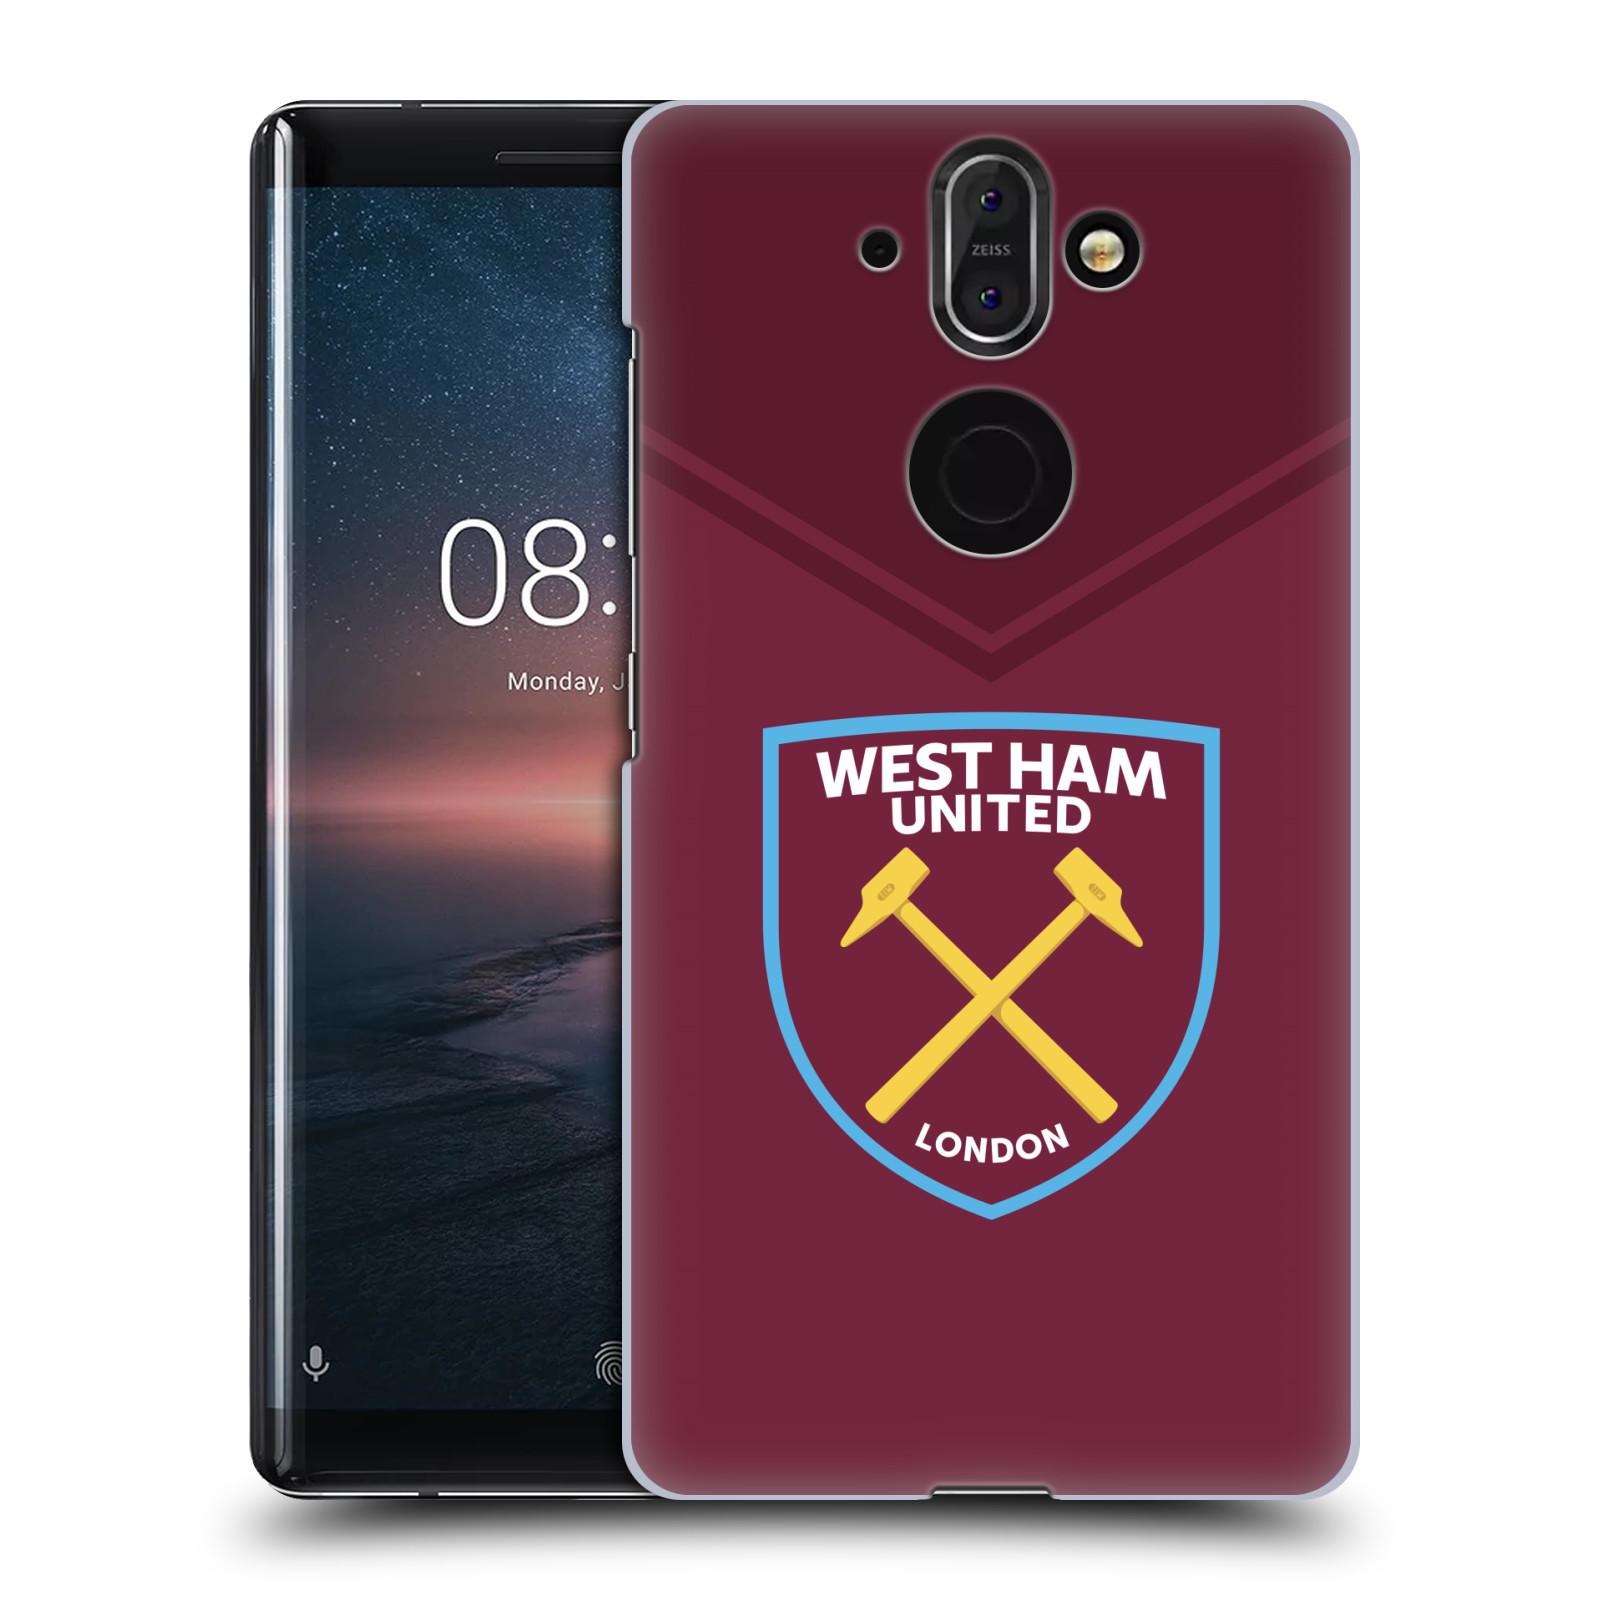 Plastové pouzdro na mobil Nokia 8 Sirocco - Head Case - West Ham United - Logo